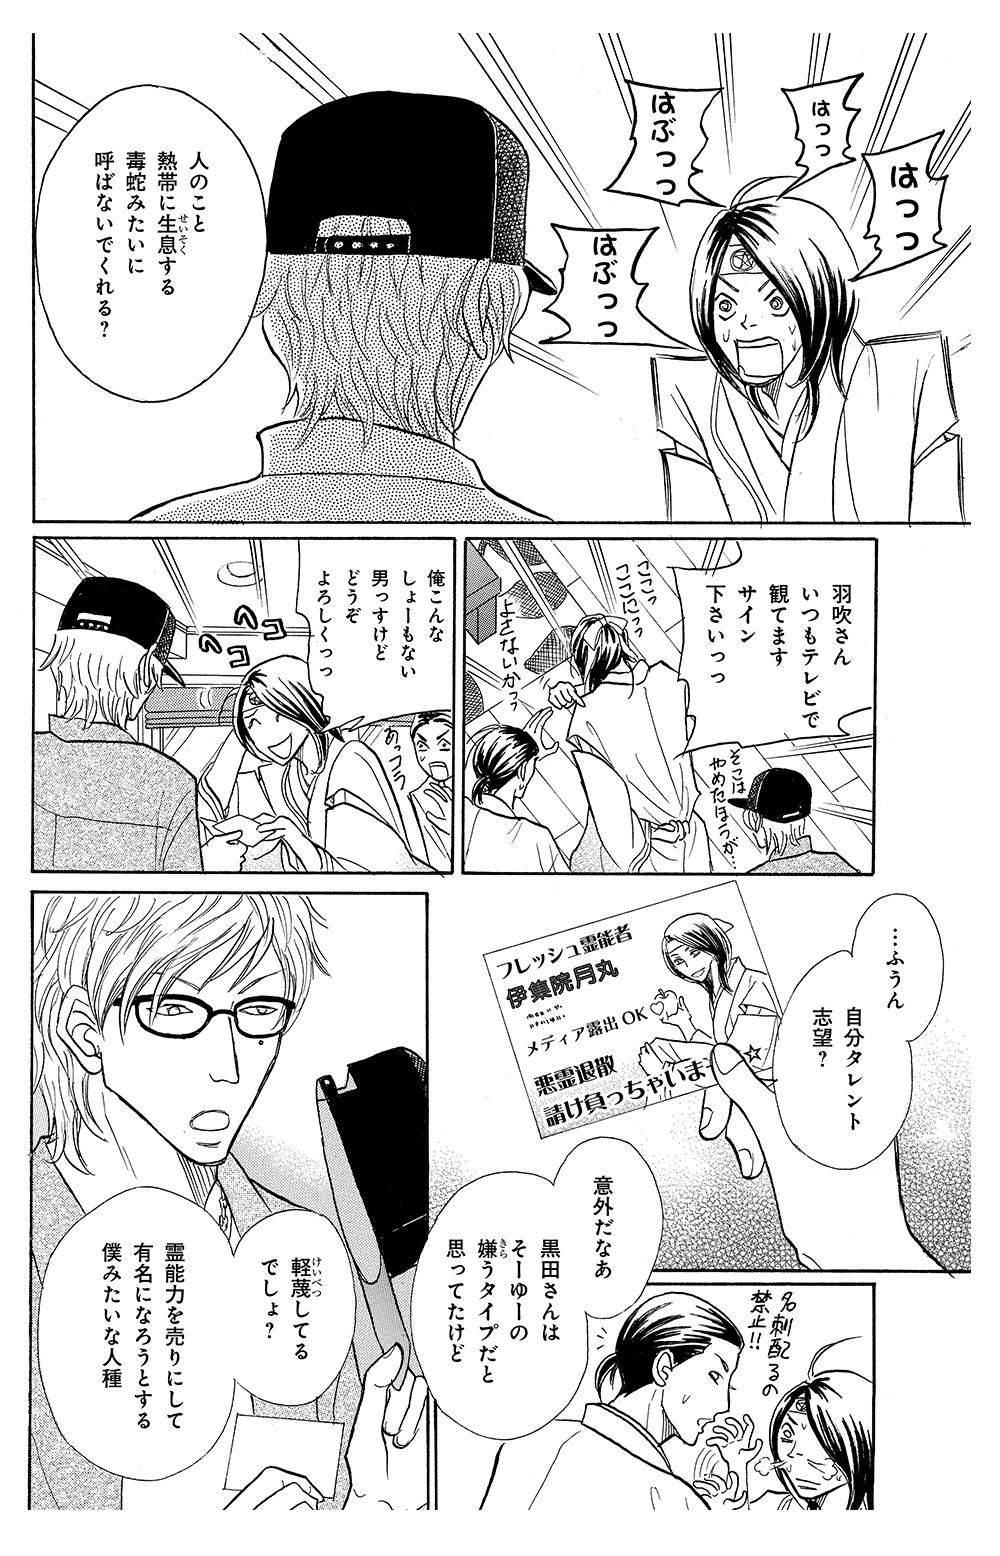 ijyuintukimaru-076.jpg